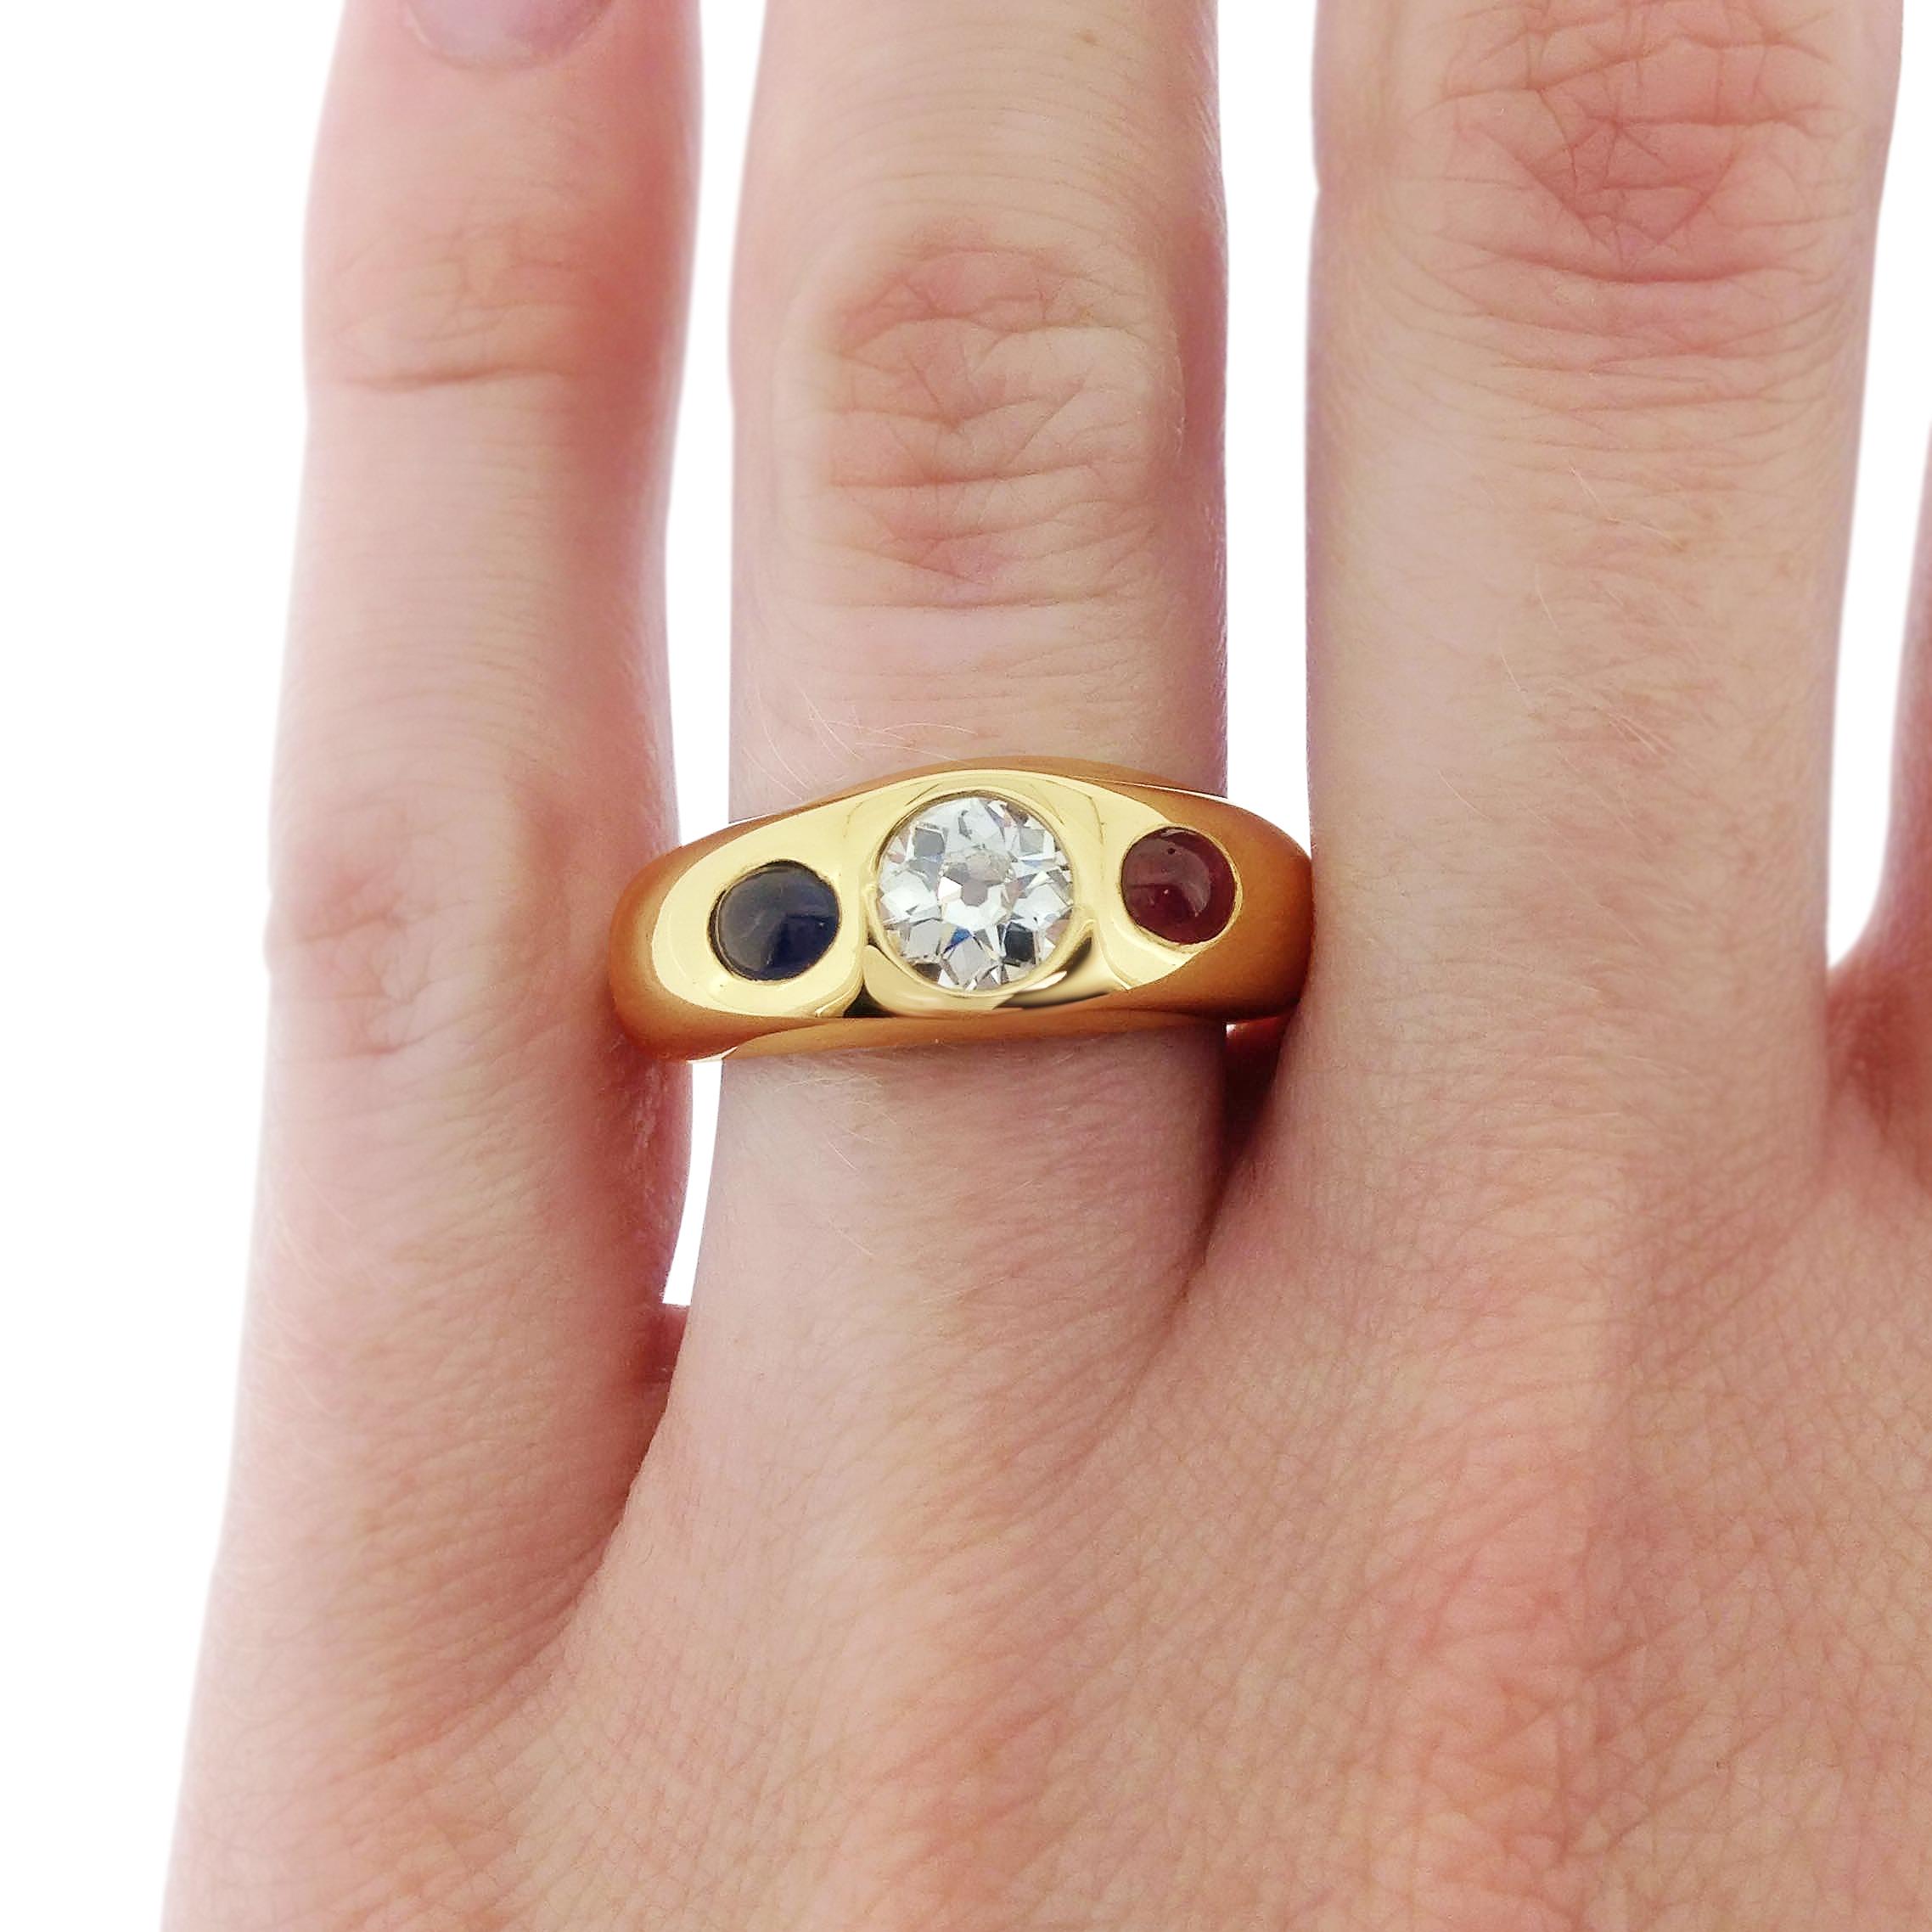 Diamond-sapphire-and-ruby-gold-gypsy-ring-1.jpg